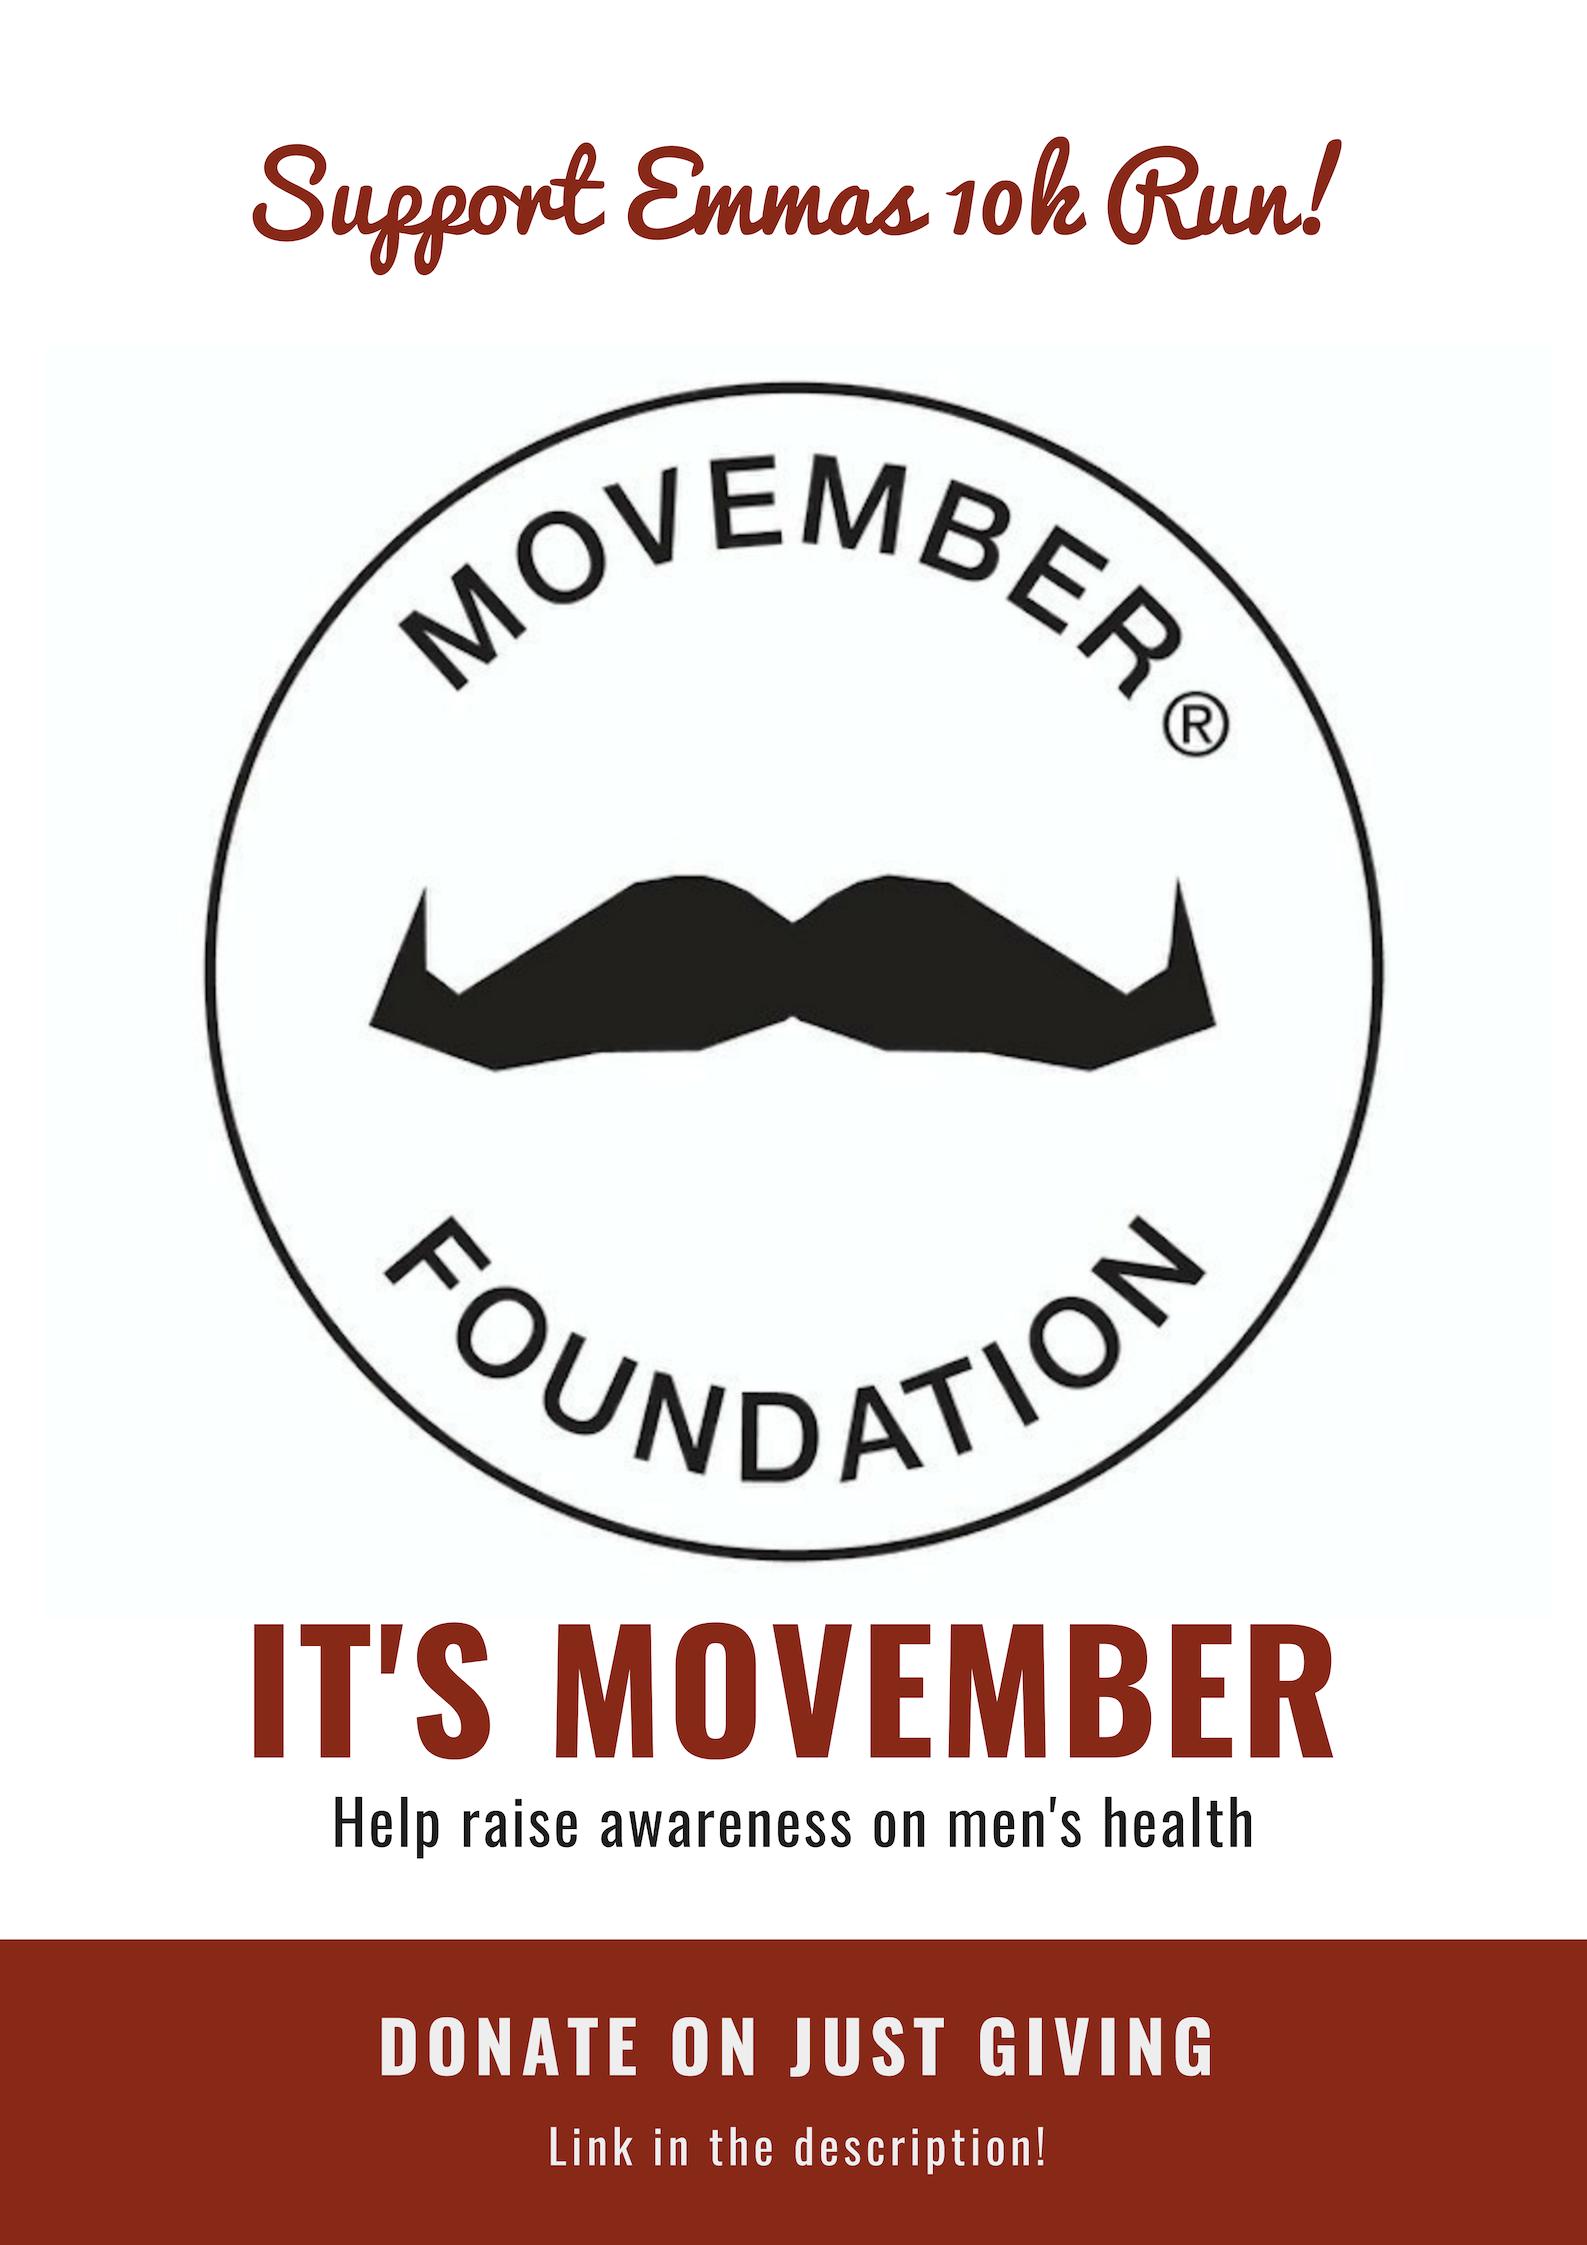 Emma Highton 10k Run for Movember